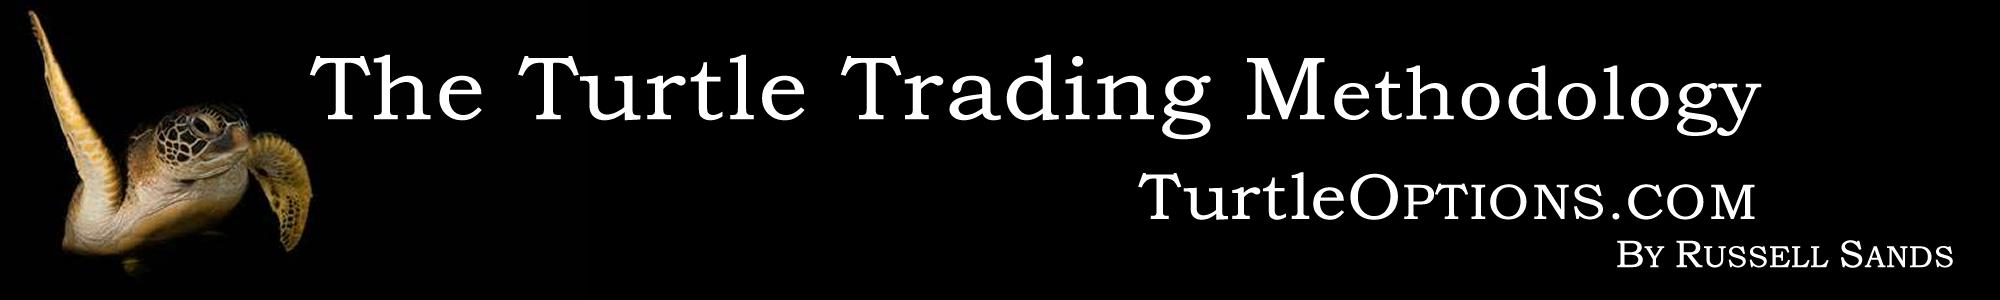 richard dennis trader